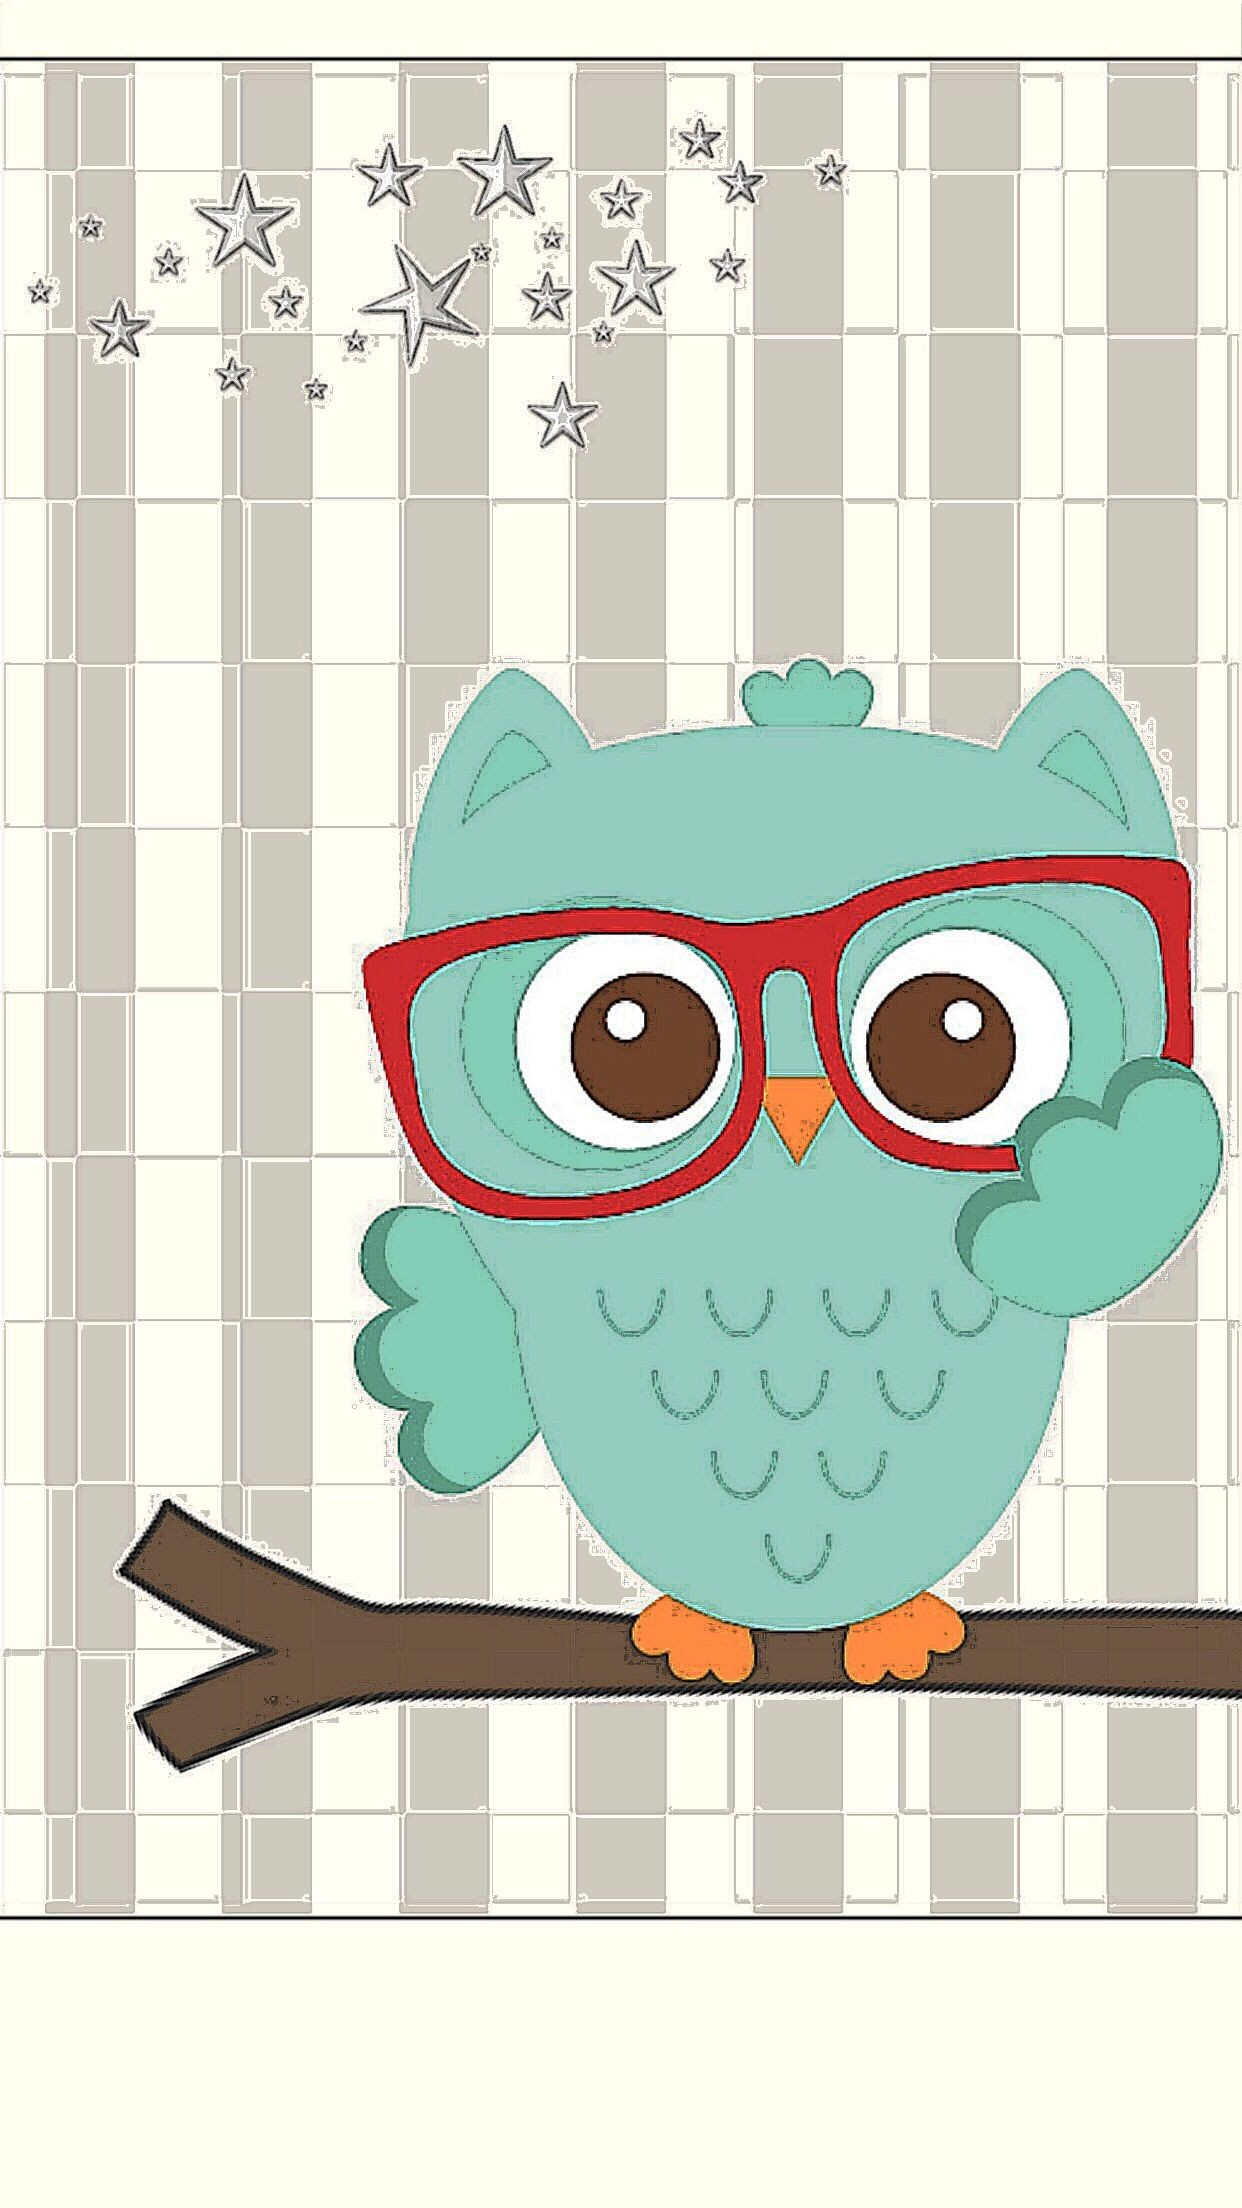 Res: 1242x2208, Owl Wallpaper, Wallpaper Ipad Mini, Funny Owls, Phone Backgrounds, Wallpaper  Backgrounds, Wallpapers Ipad, Cute Owl, Classroom Rules, Eye Glasses